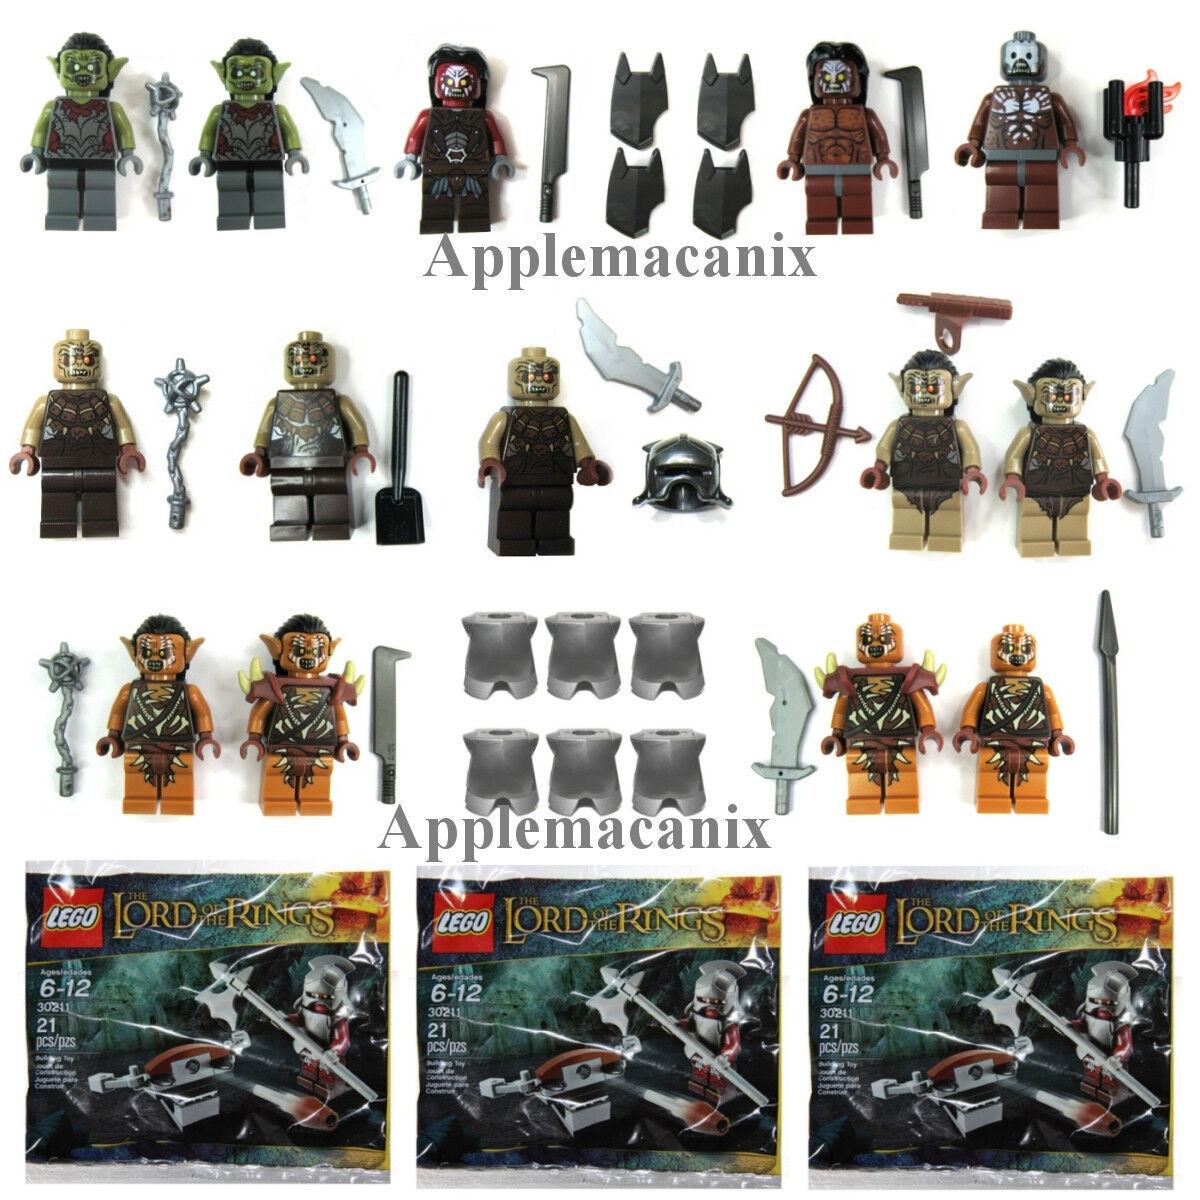 Lego Lord of the Rings Hobbit Figurine Lot Gundabad Mordor La Moria Uruk-Hai Orc